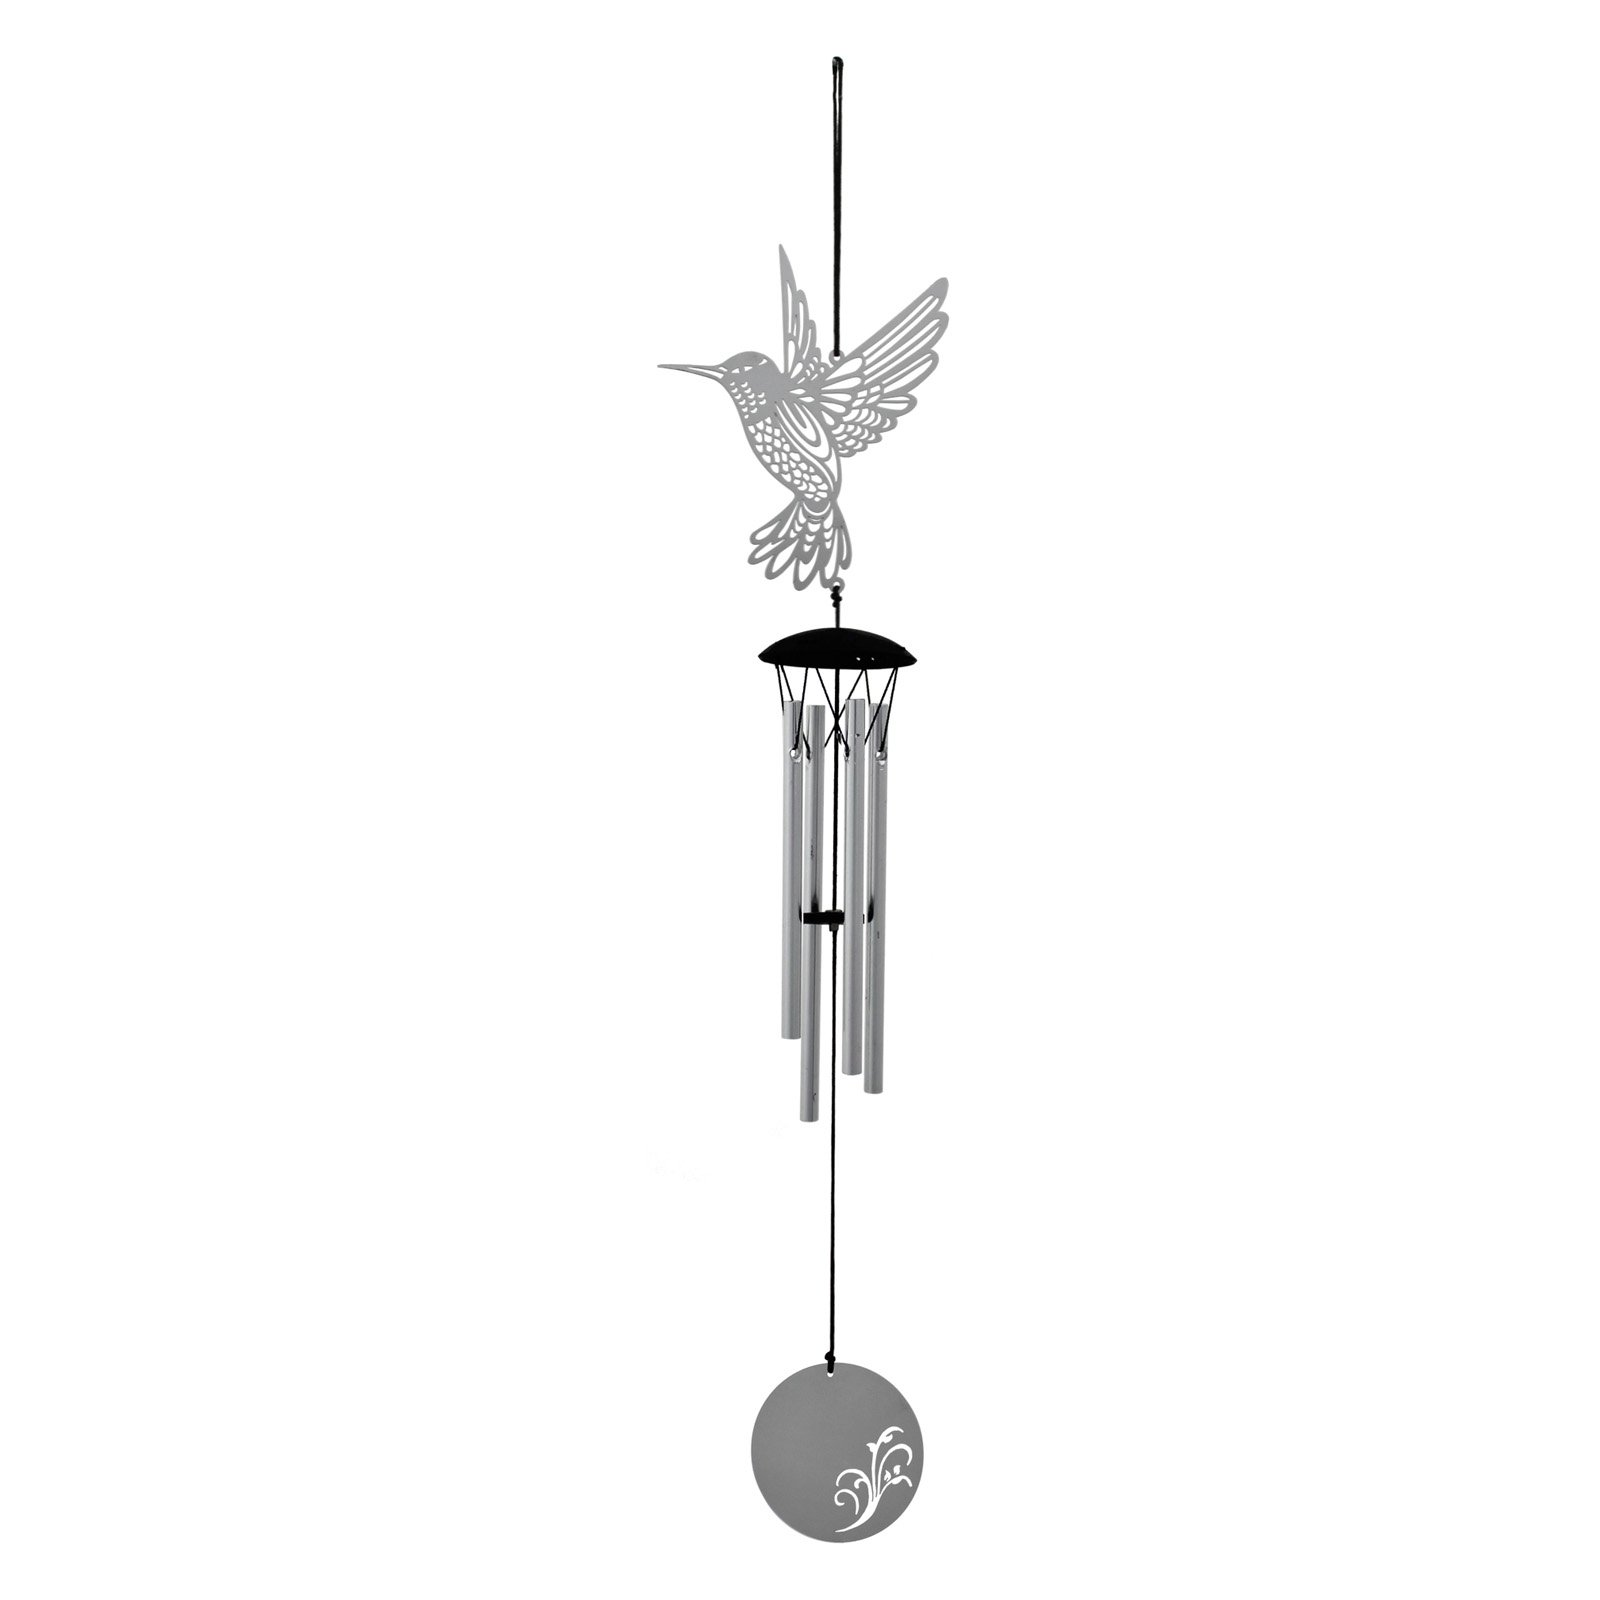 Woodstock Flourish Metal Hummingbird Wind Chime by Woodstock Chimes